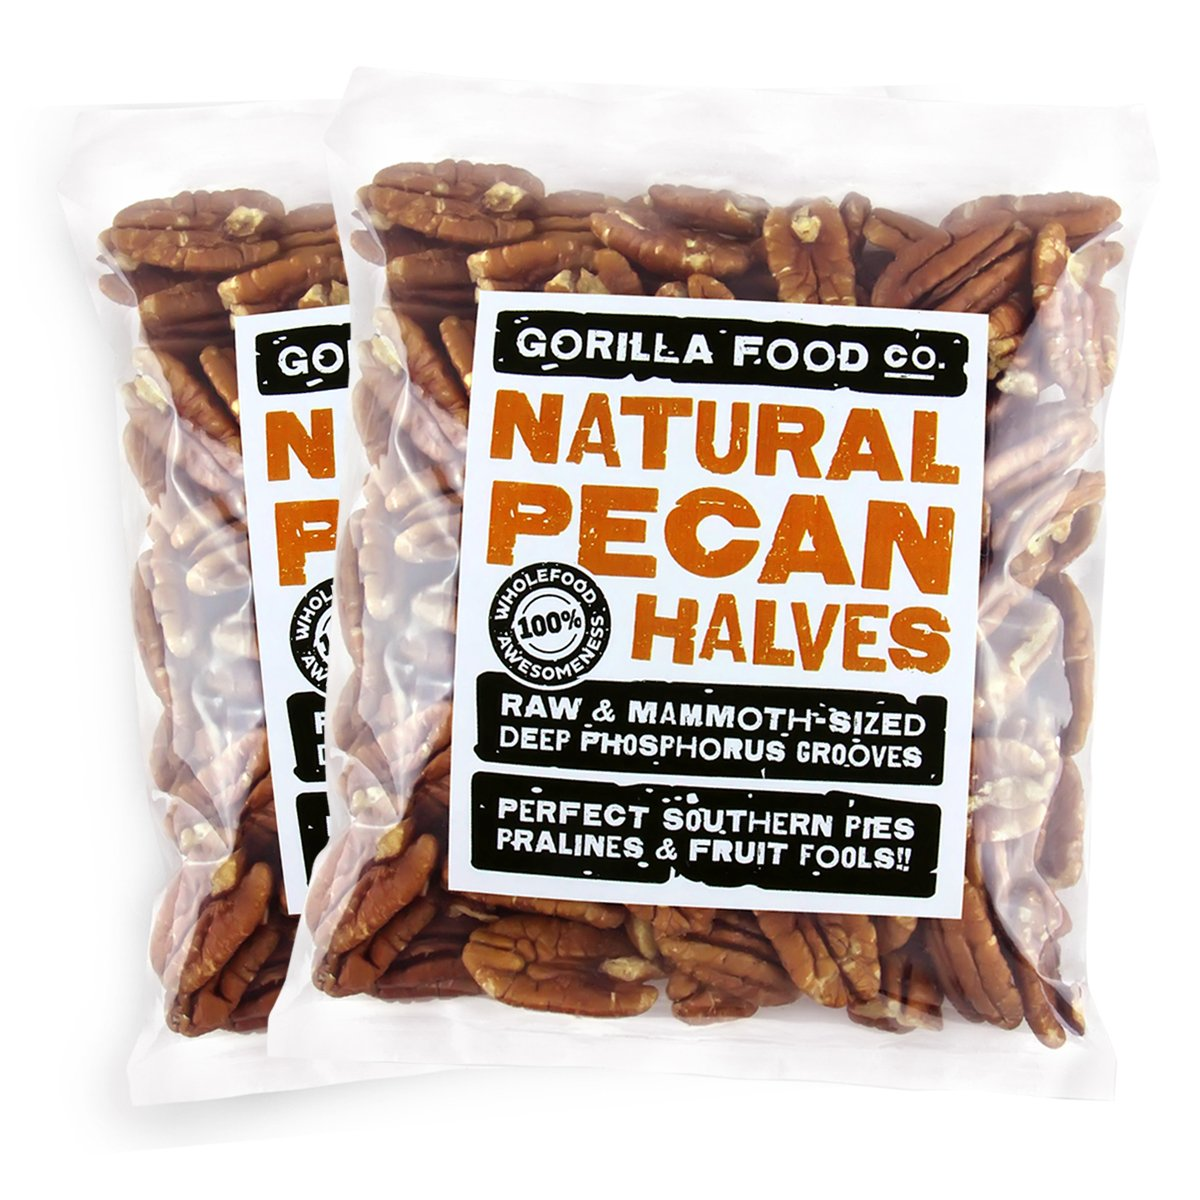 Gorilla Food Co. Overseas parallel import regular item Pecan Halves Raw Jr. 1 Packs Pound Super popular specialty store - Mammoth 2